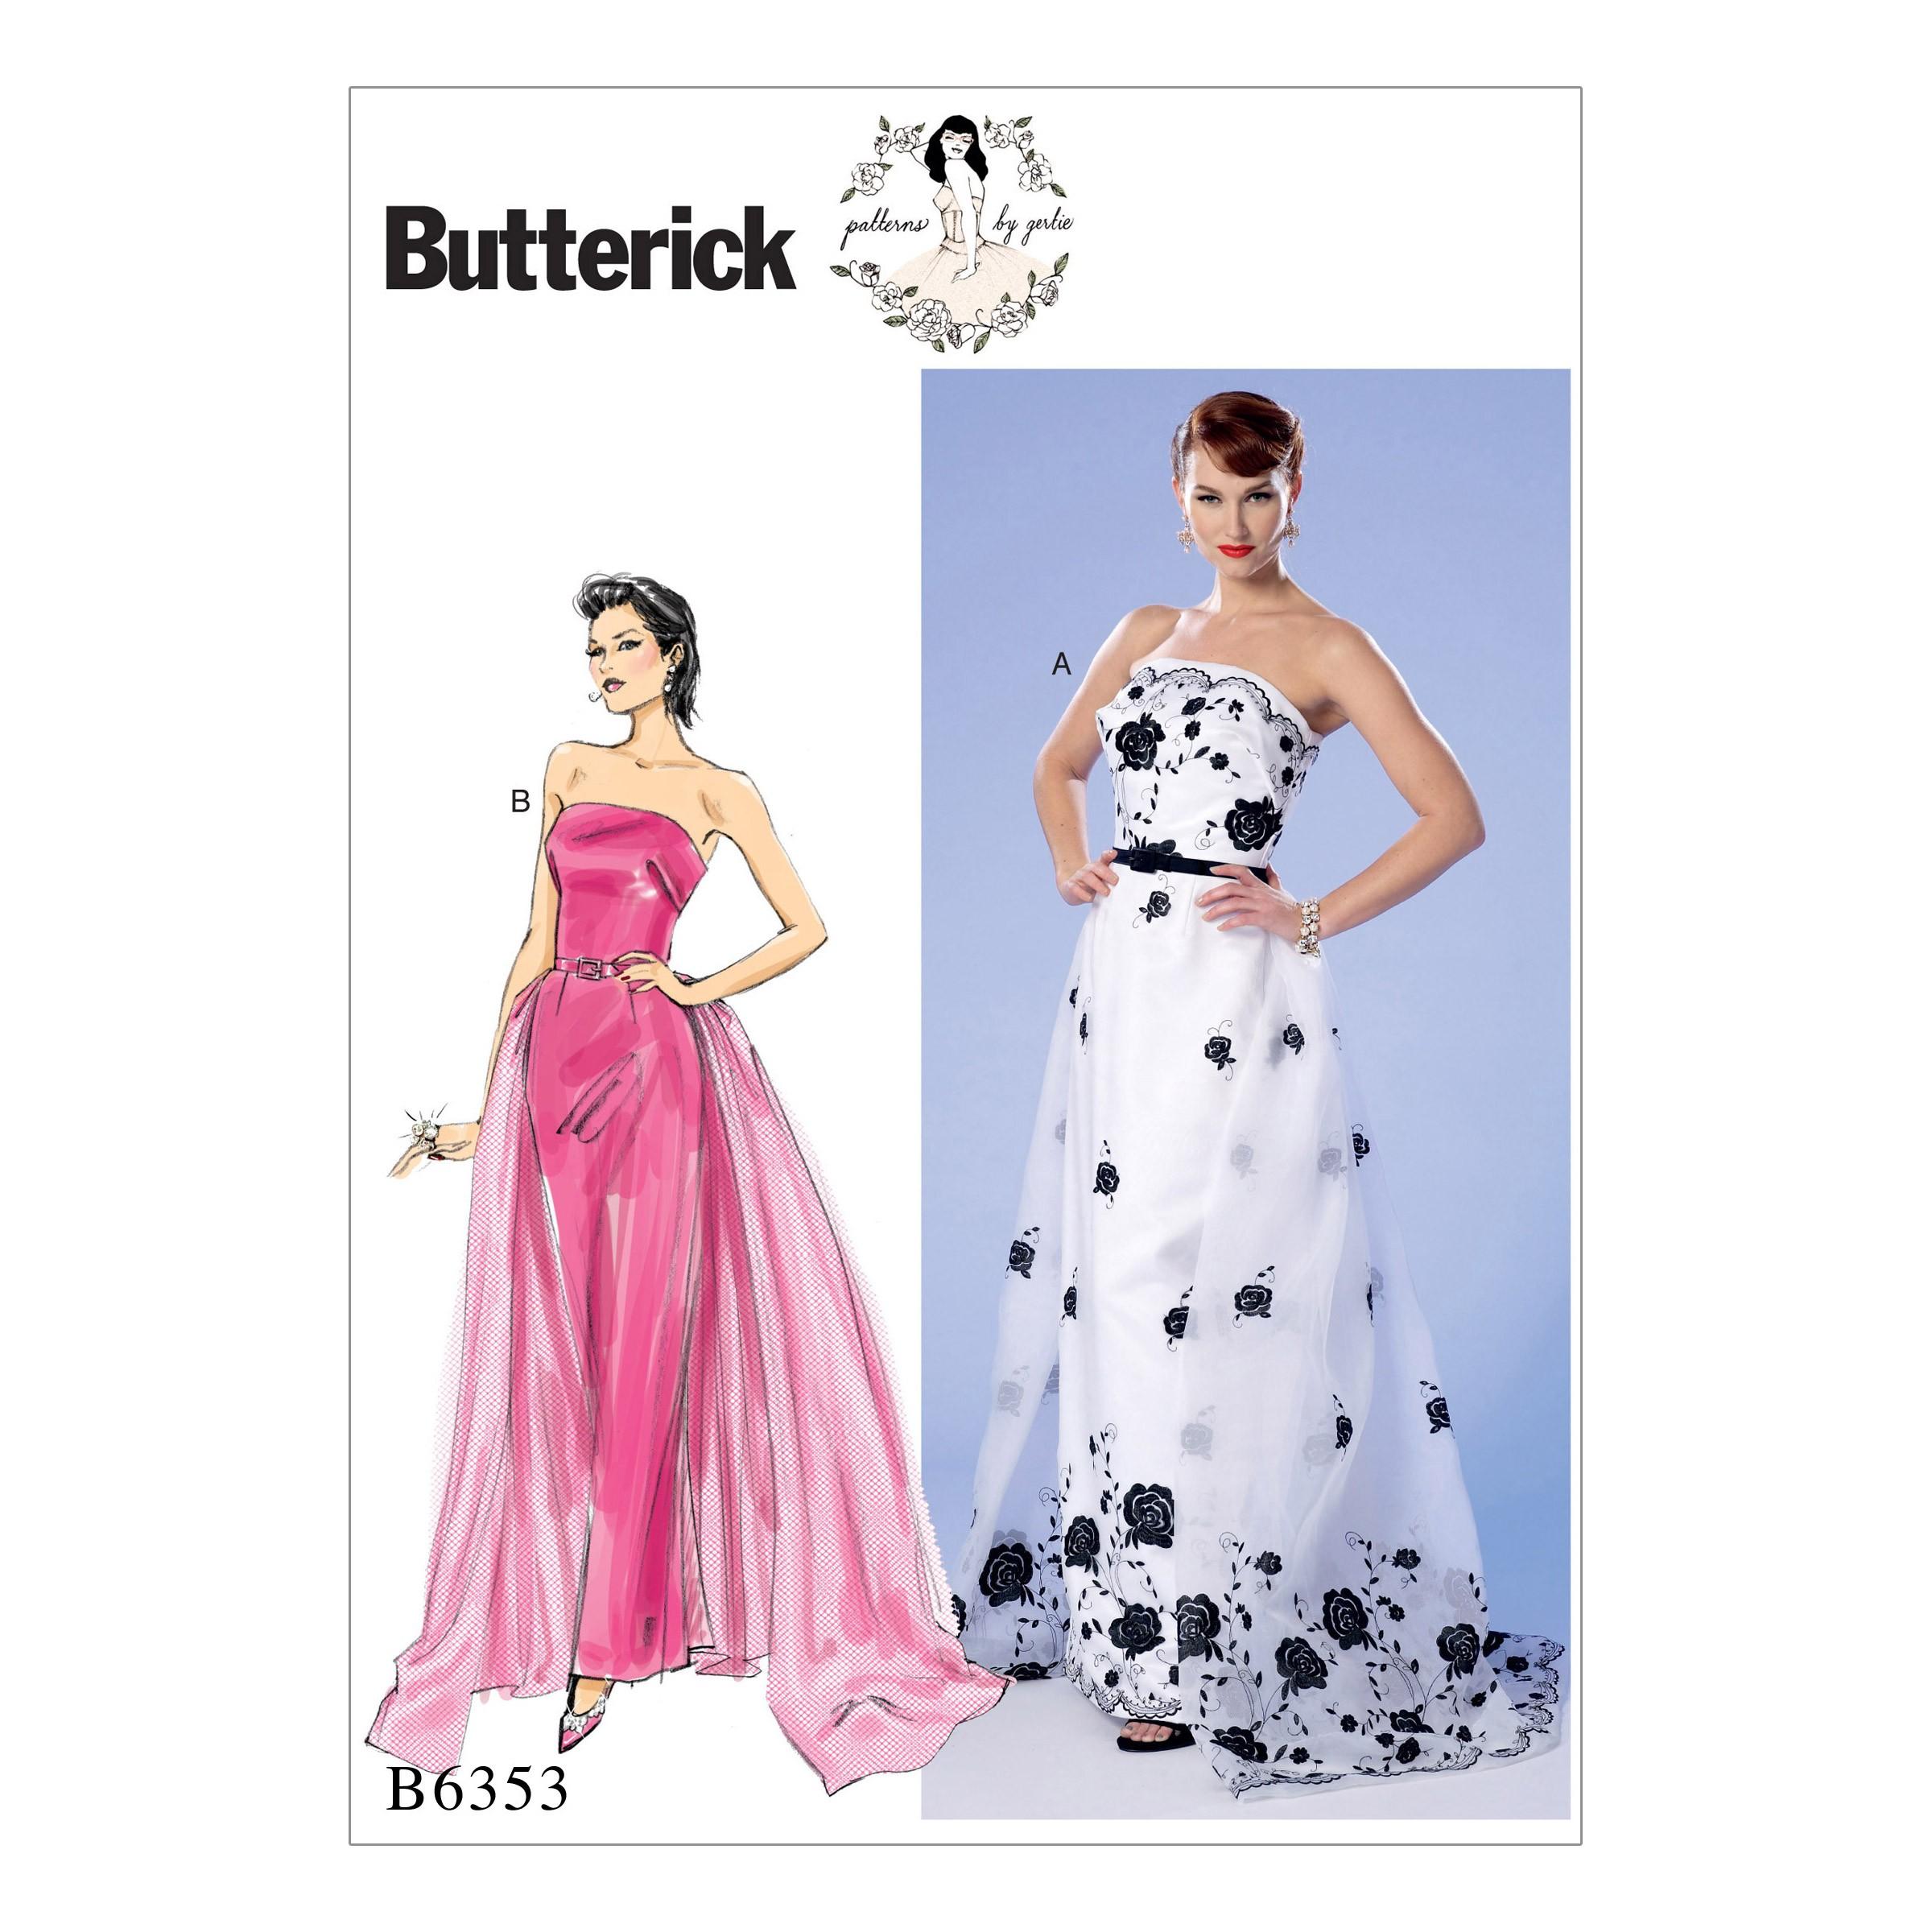 Butterick Sewing Pattern 6353 Misses' Strapless Dress Detachable Train & Belt